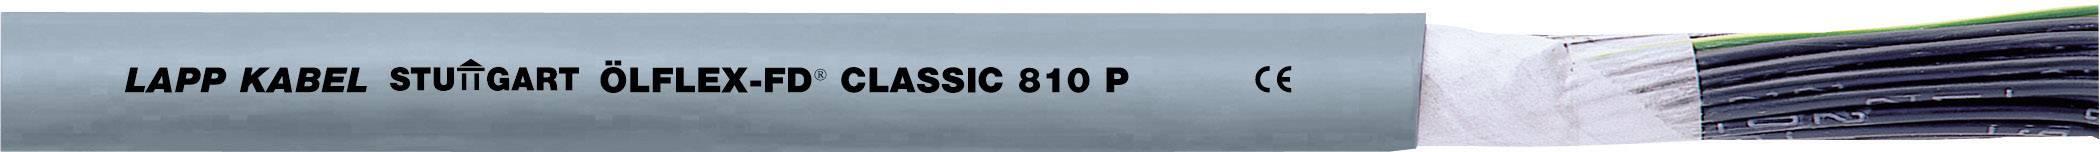 Tažný kabel LappKabel ÖLFLEX® FD CLASSIC 810 P 3G1 (0026331), 3x 1 mm², polyurethan, Ø 7,1 mm, nestíněný, 1 m,